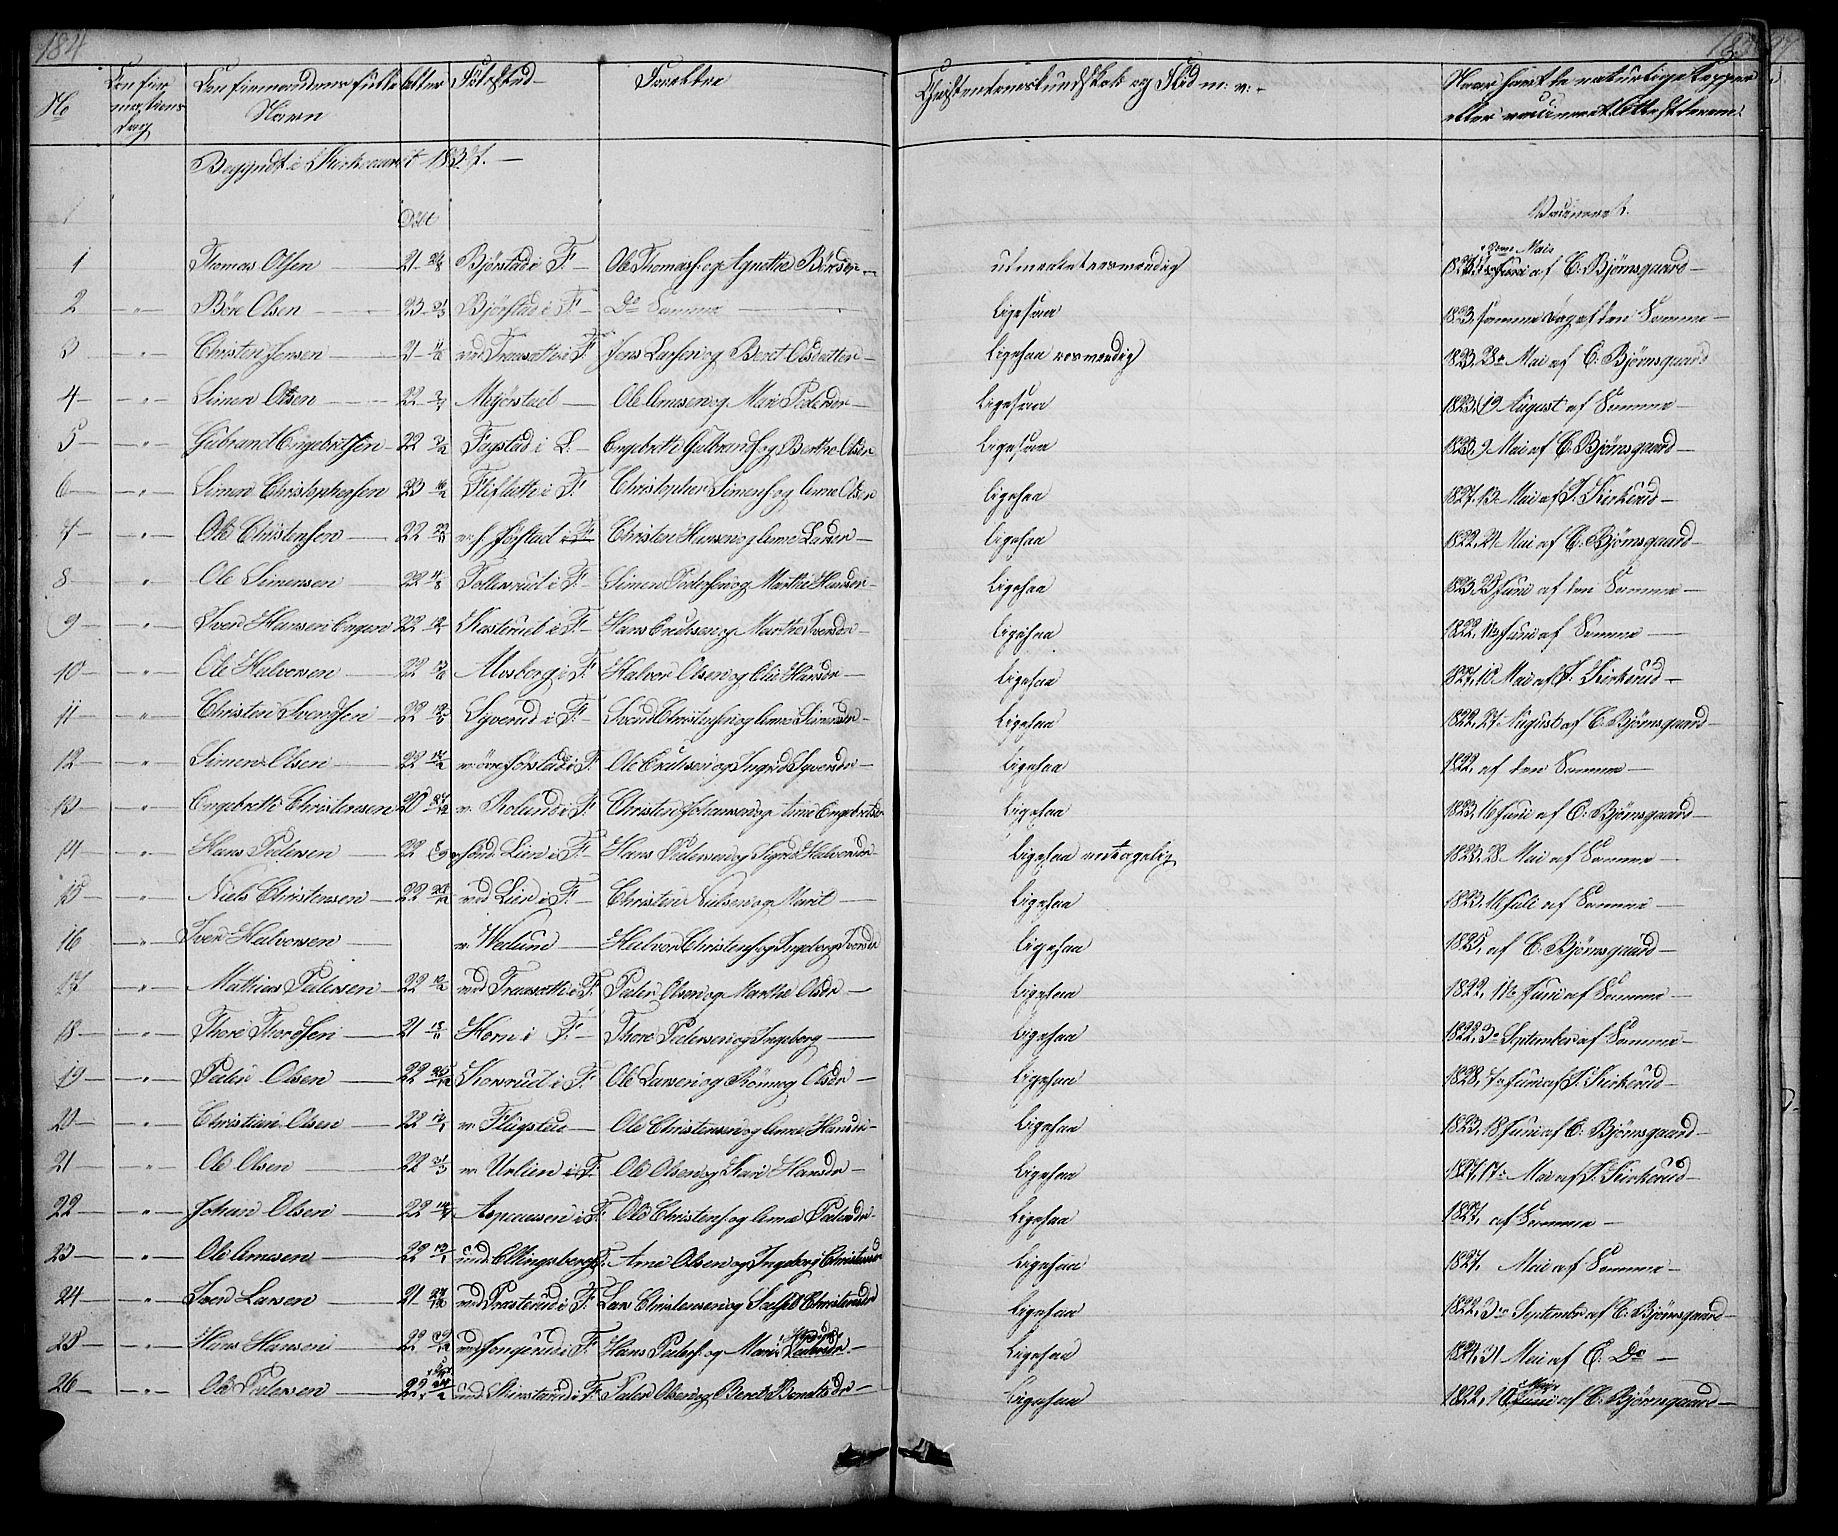 SAH, Fåberg prestekontor, Klokkerbok nr. 5, 1837-1864, s. 184-185